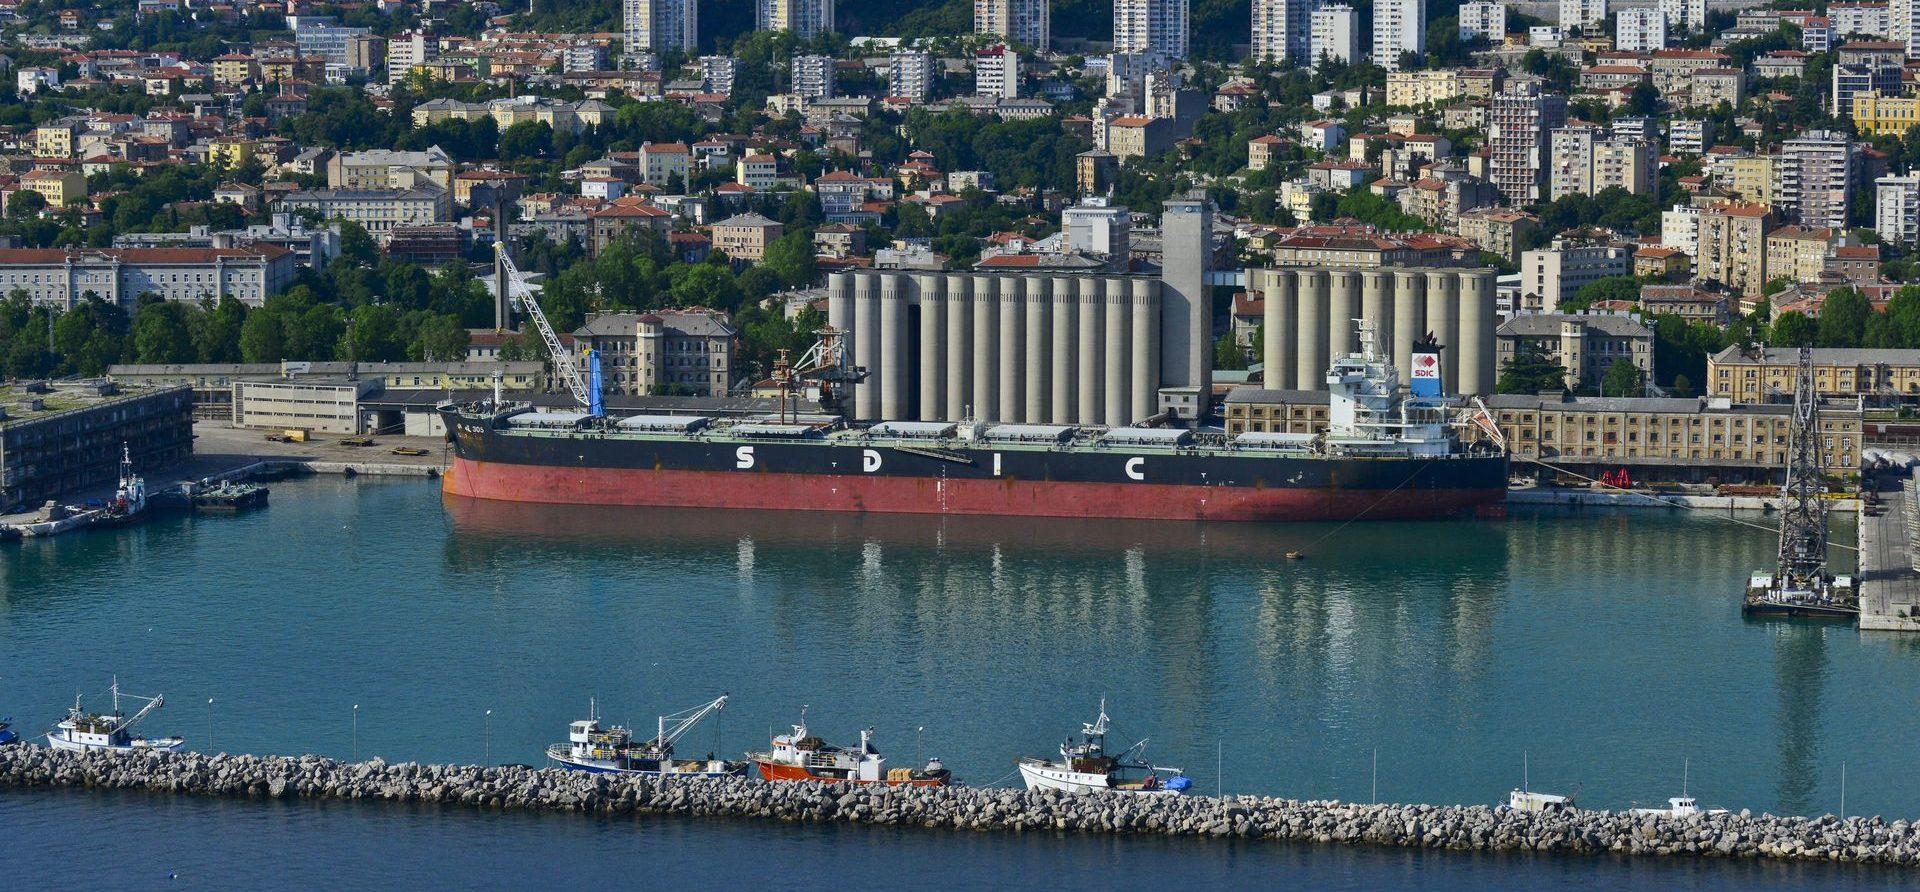 OT Logistics raises stake inLuka Rijeka, sells part of shares to Polish International Development Fund